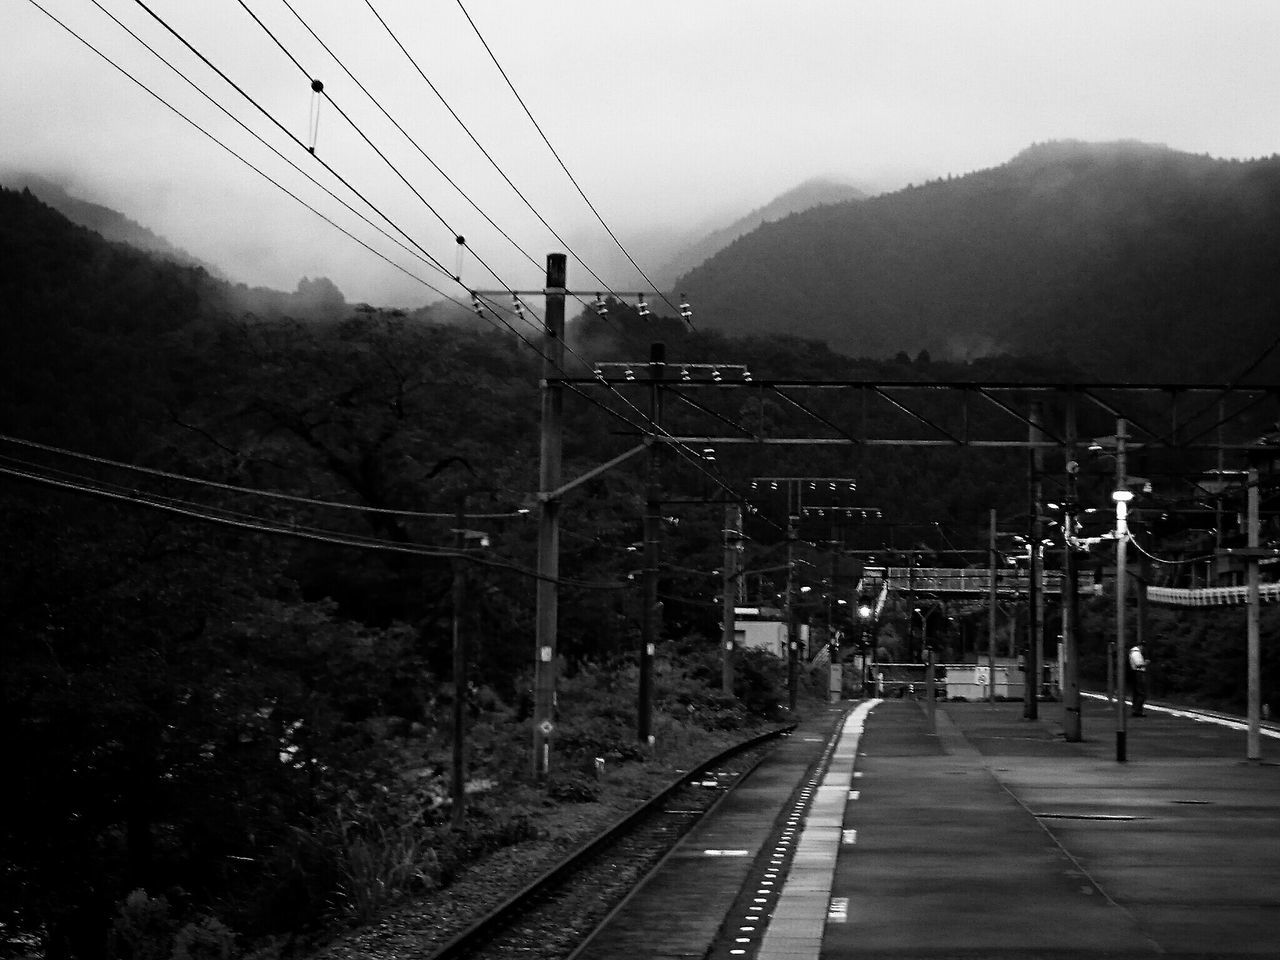 Local Line Train Station Mountains Taking Photos EyeEm Best Shots - Black + White Monochrome